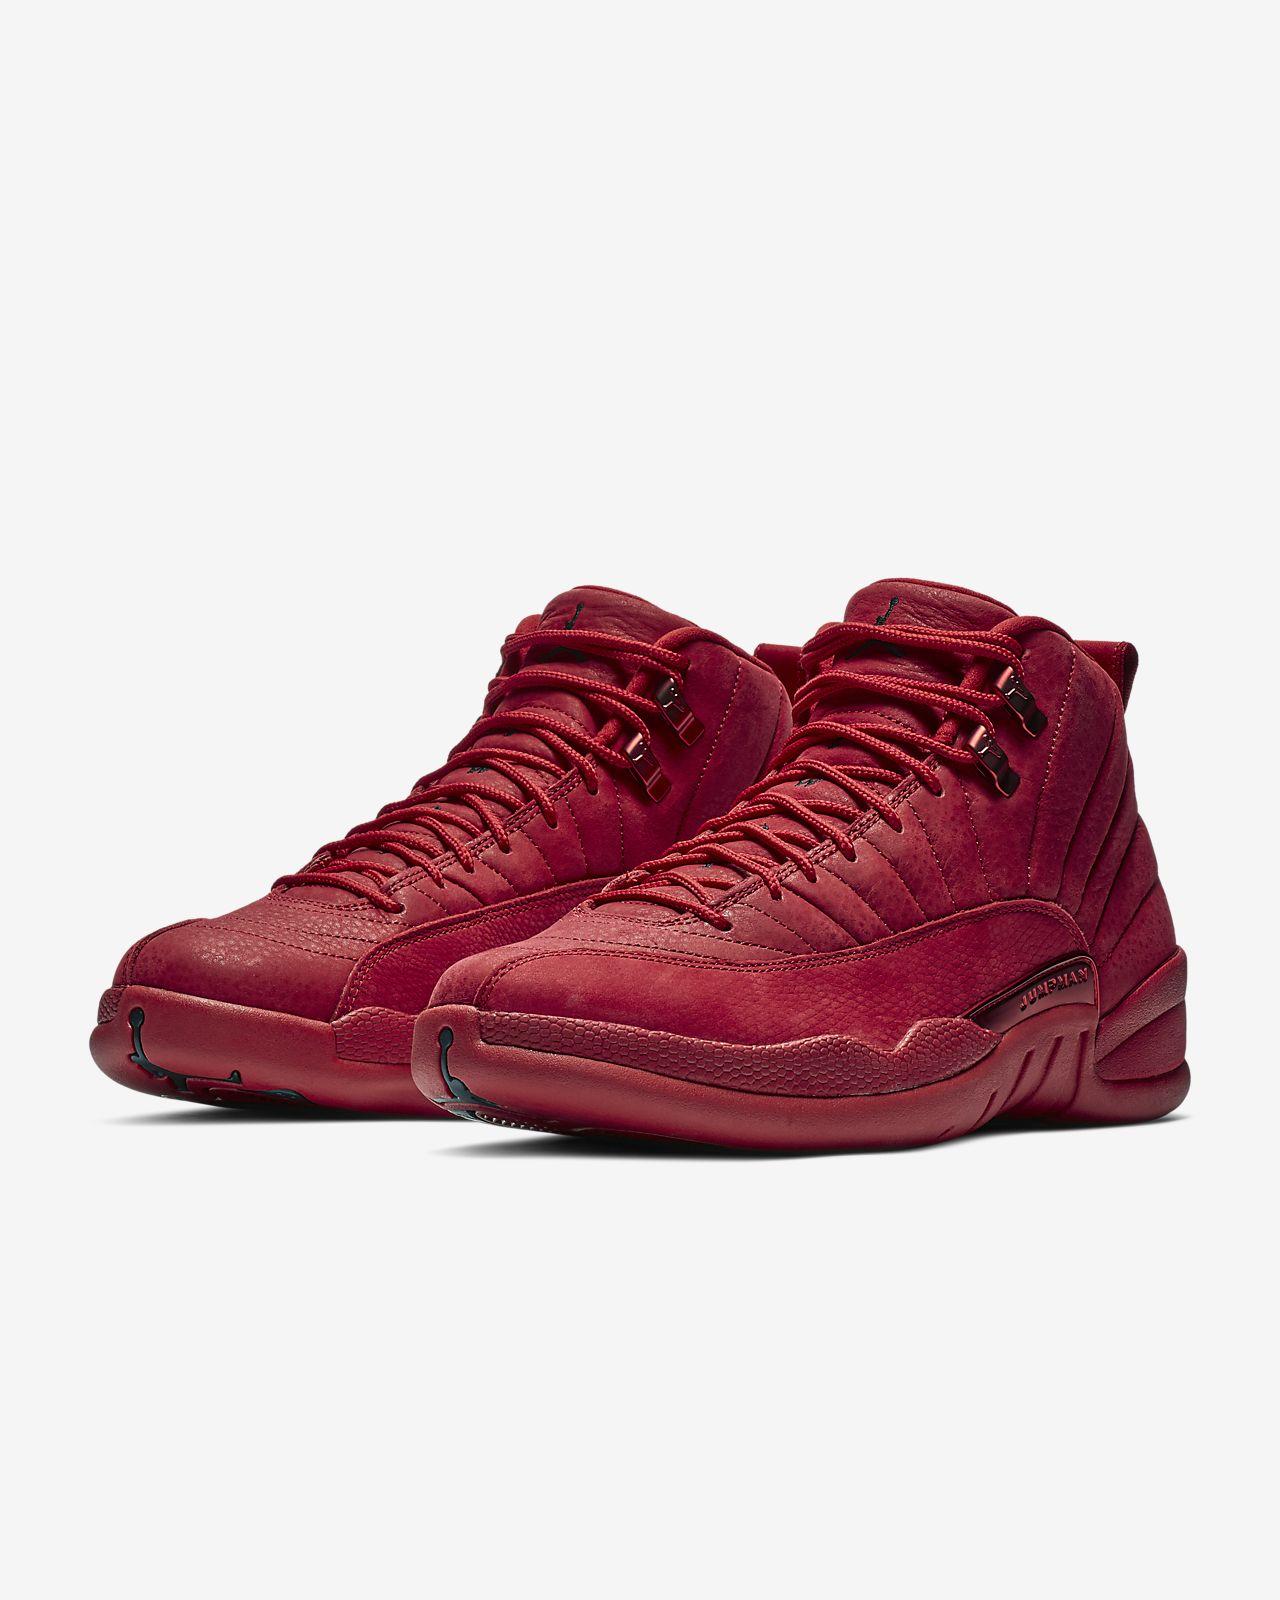 new arrival ae11e 17ef2 ... Air Jordan 12 Retro Men s Shoe